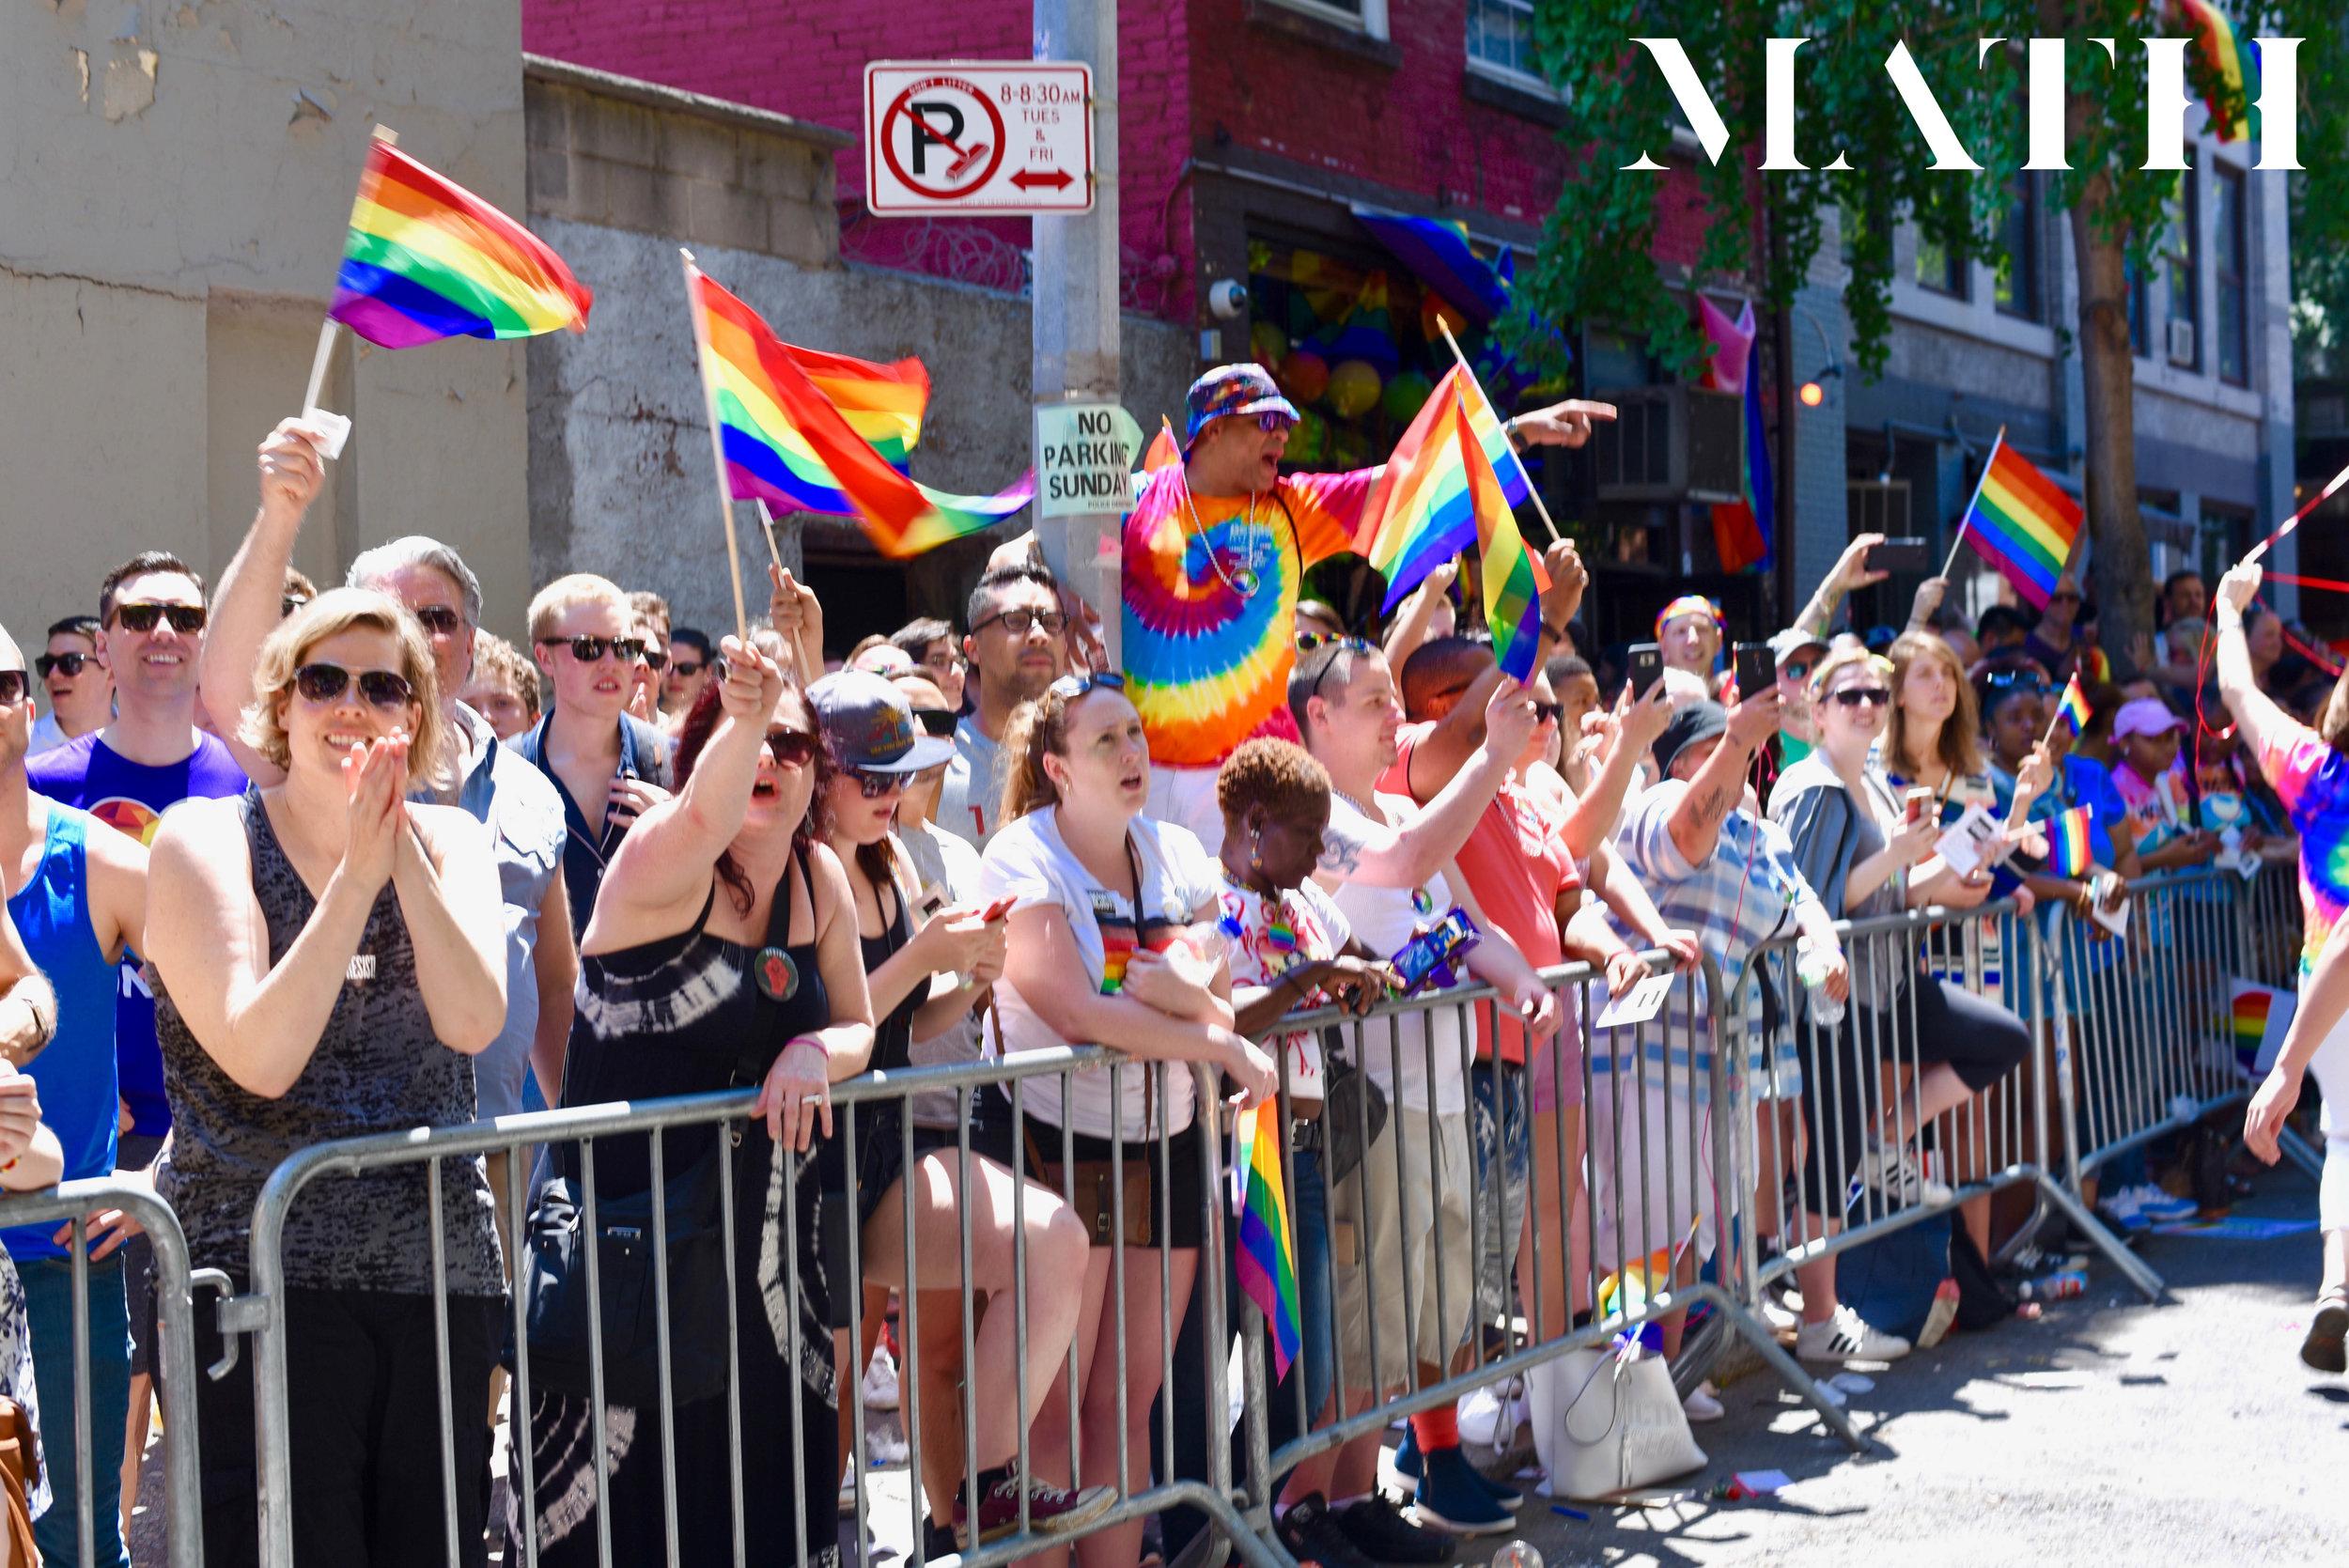 NYC Pride_Ginger Hollander 14.jpg